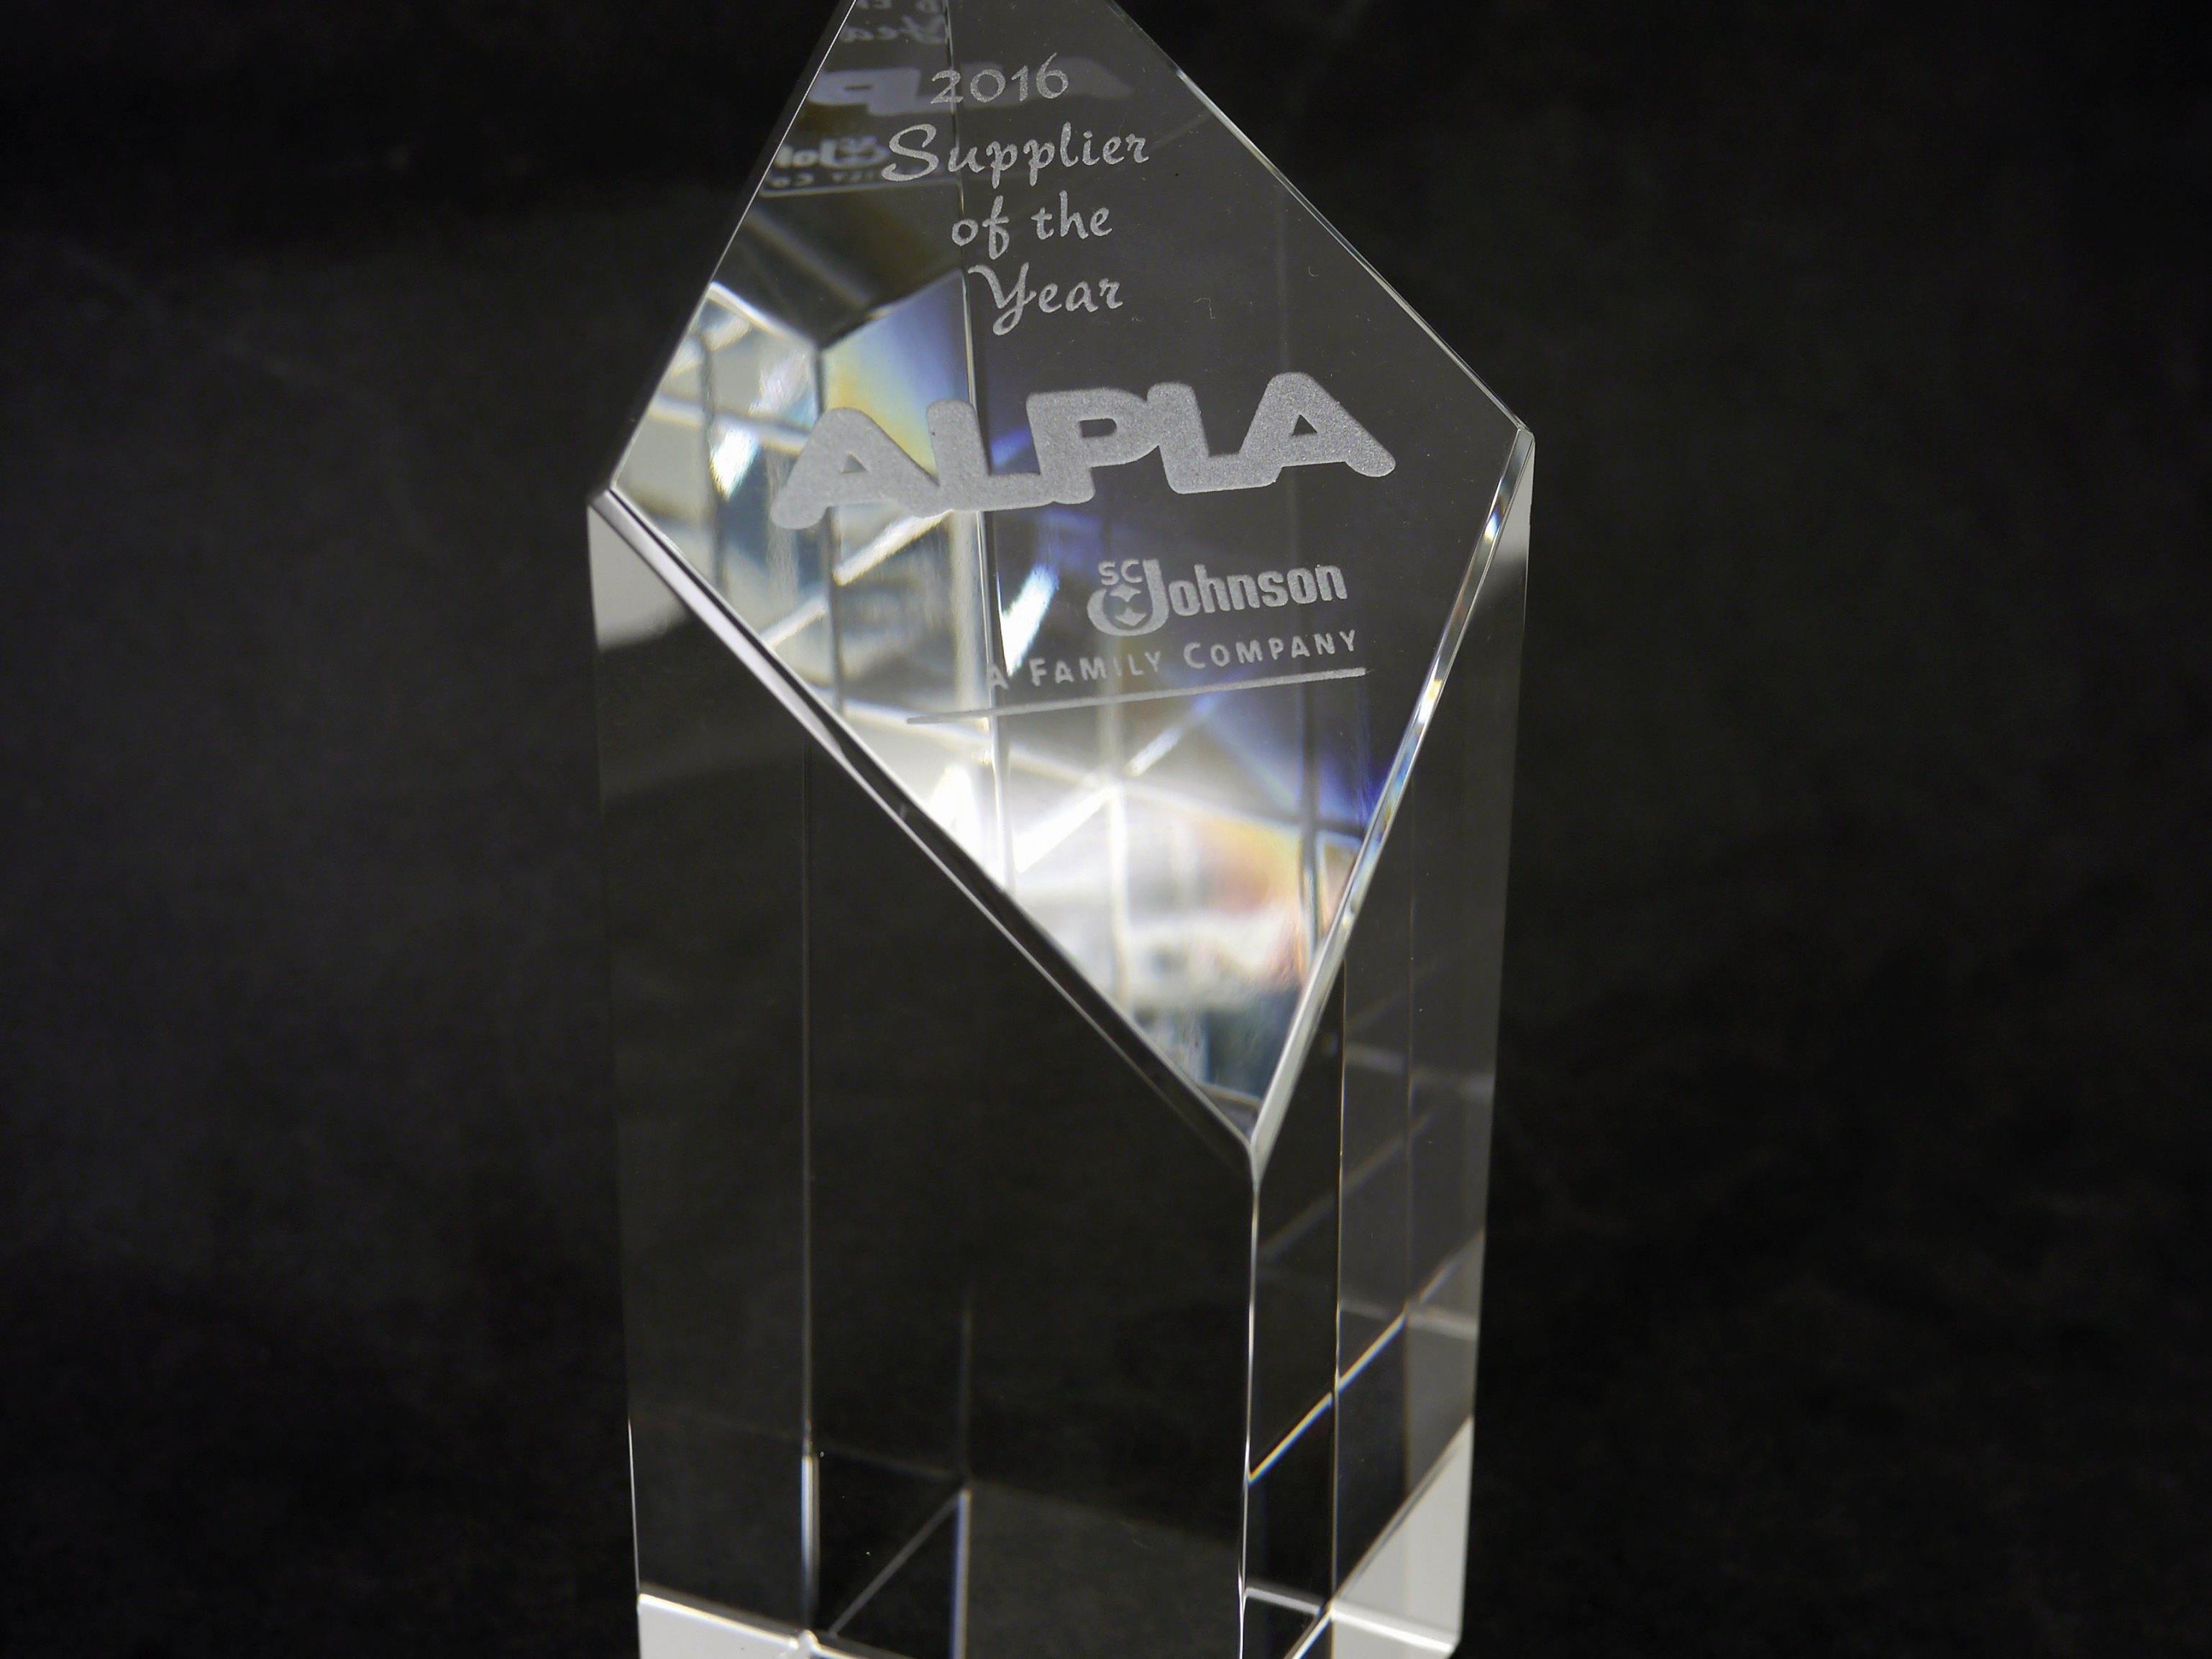 ALPLA erhält den Overall Supplier Excellence Award 2016